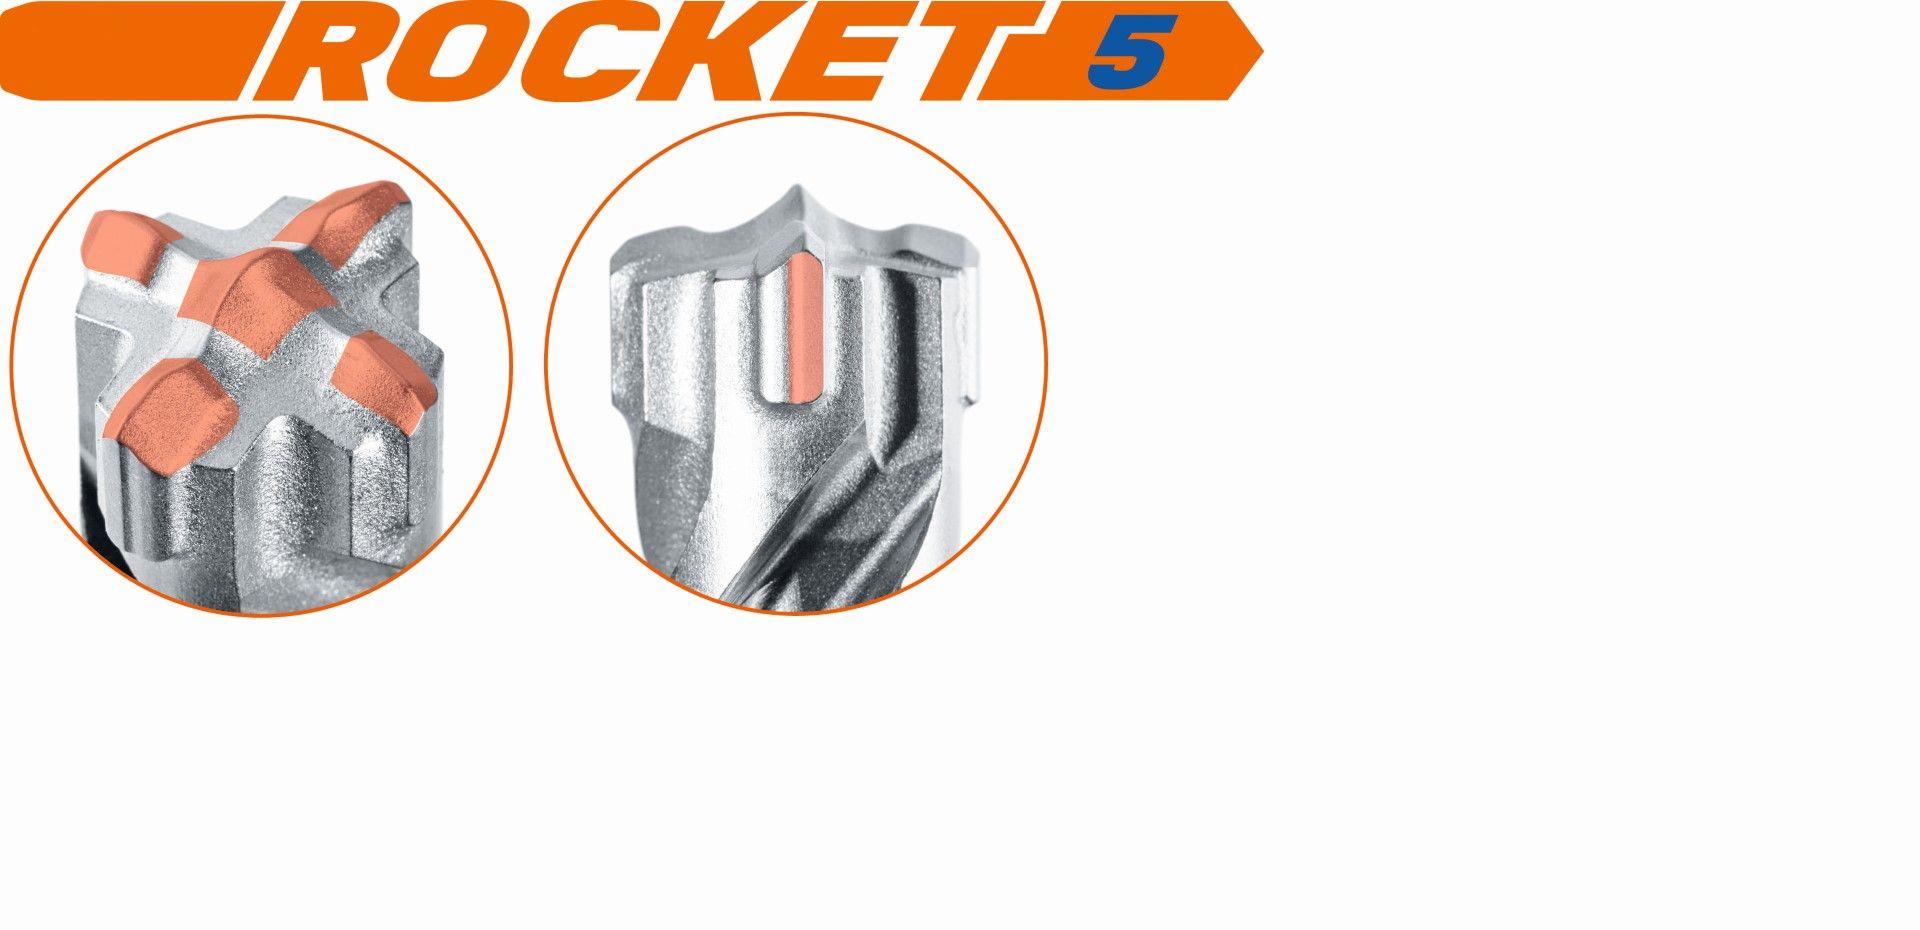 Slika BORER Rocket 5 SDS-plus 8x210 mm 4 kraka